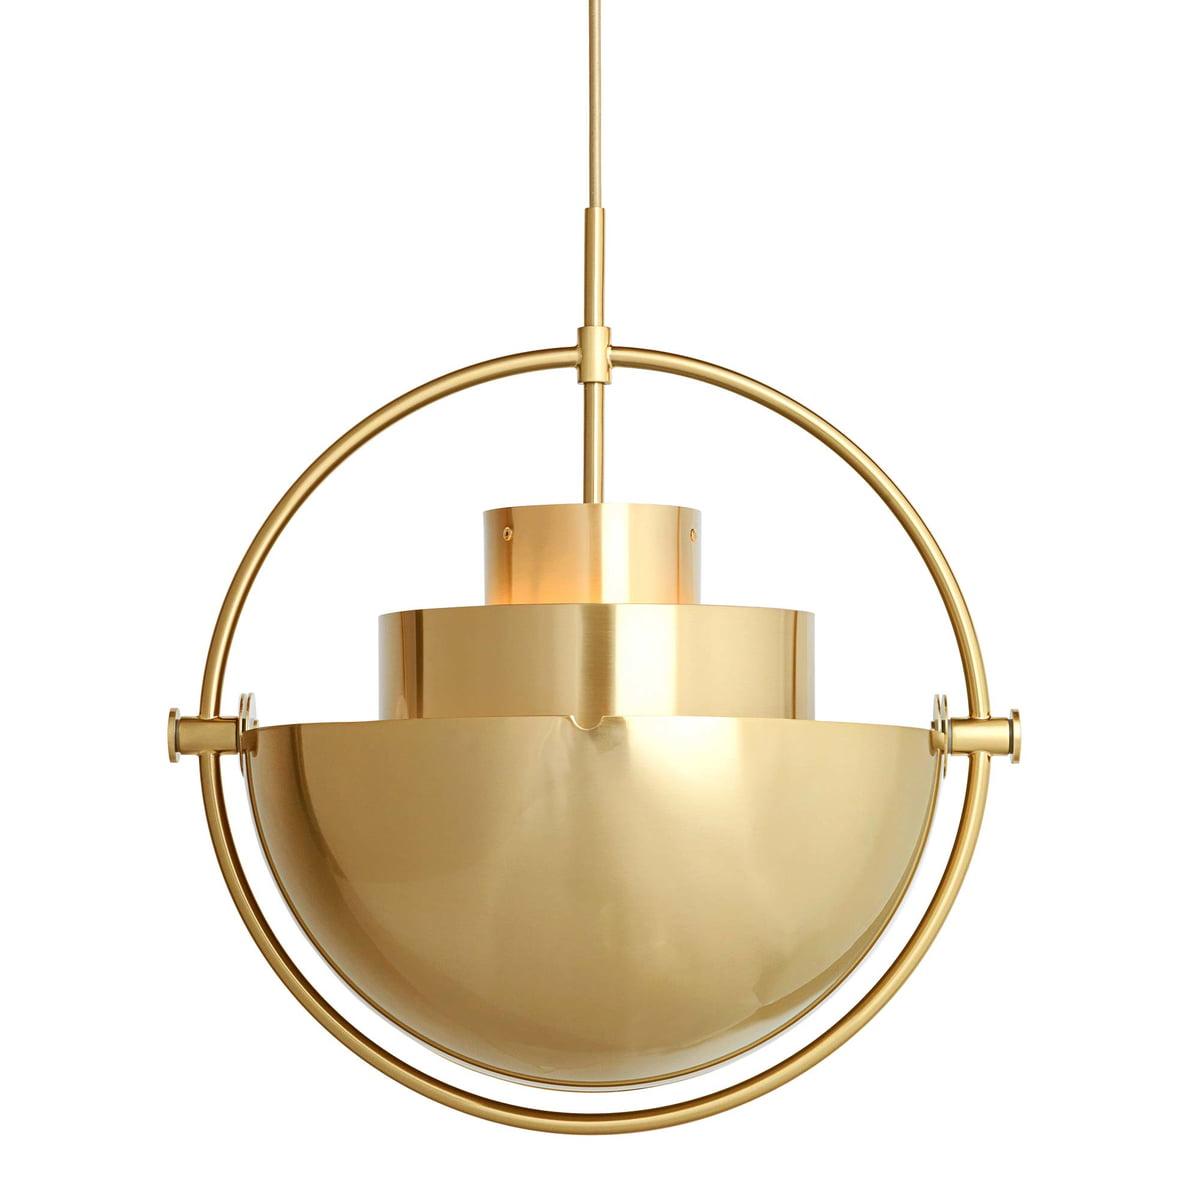 Multi Lite Pendant Light Ø 36 Cm By Gubi In Brass